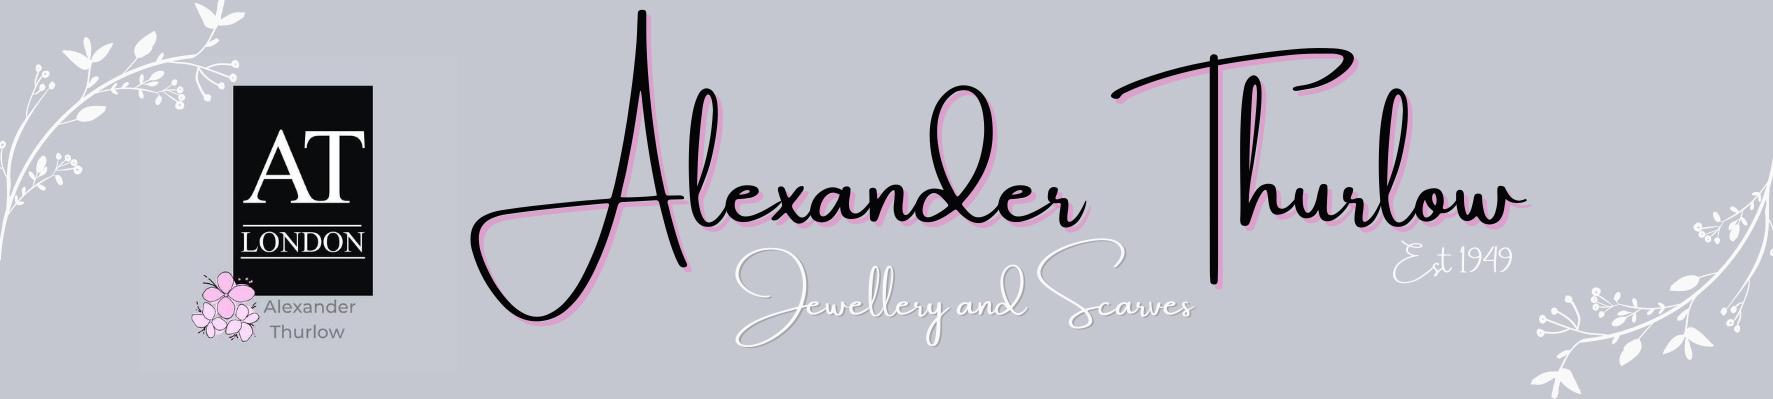 Alexander Thurlow & Co